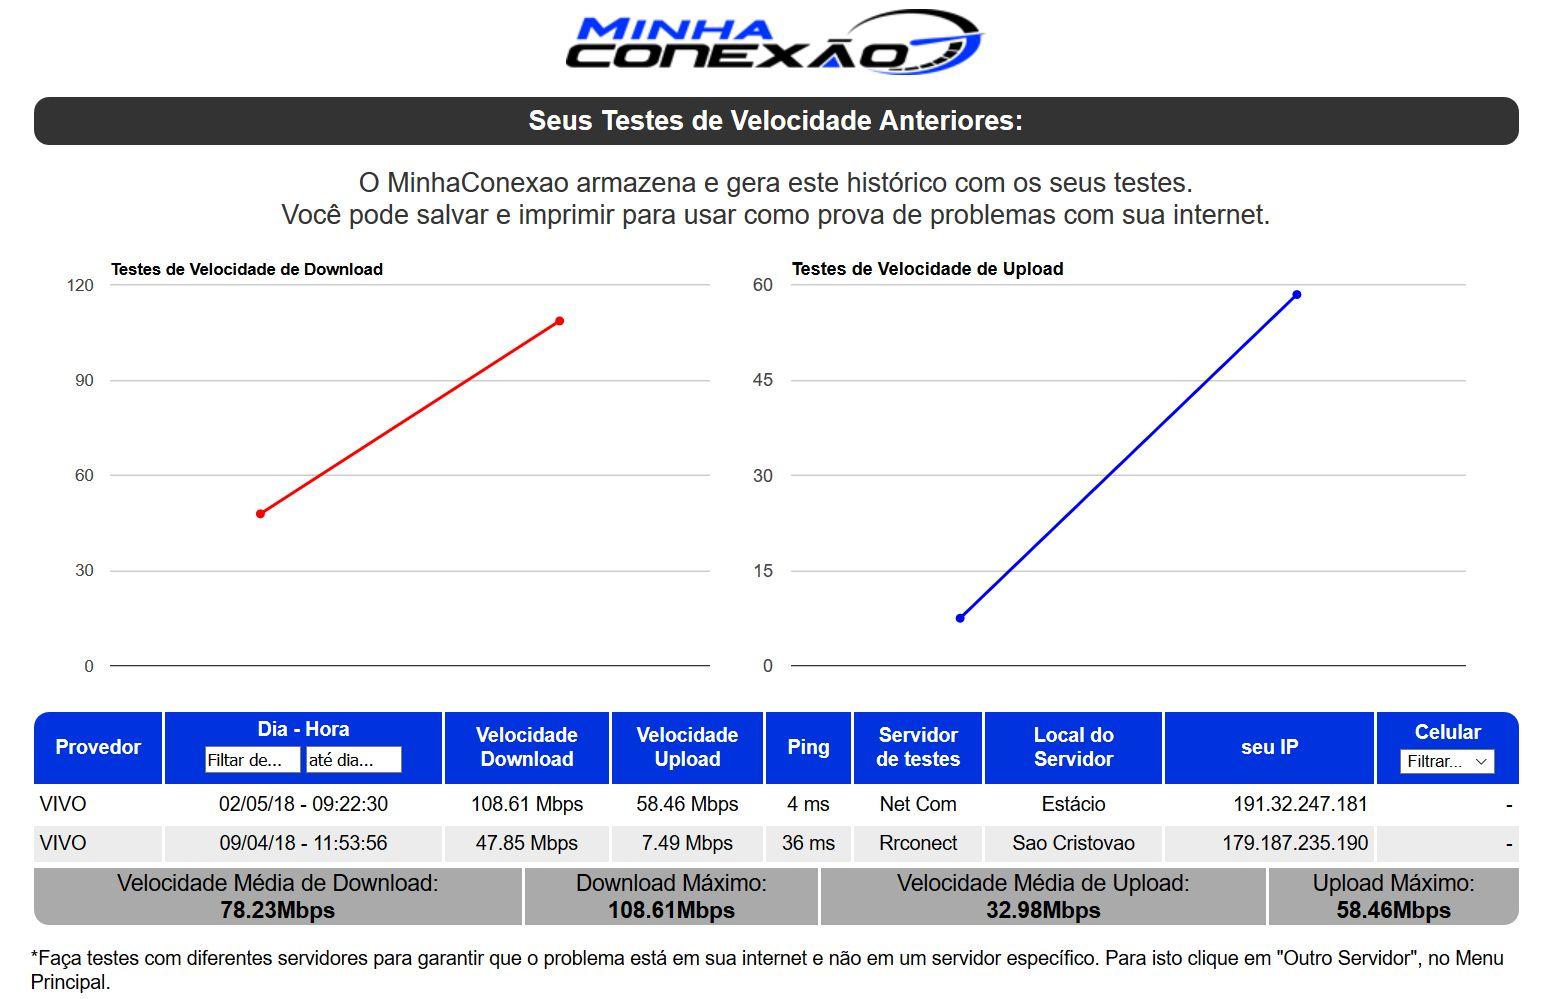 teste de velocidade minhaconexao Vivo Fibra 100 megas RJ